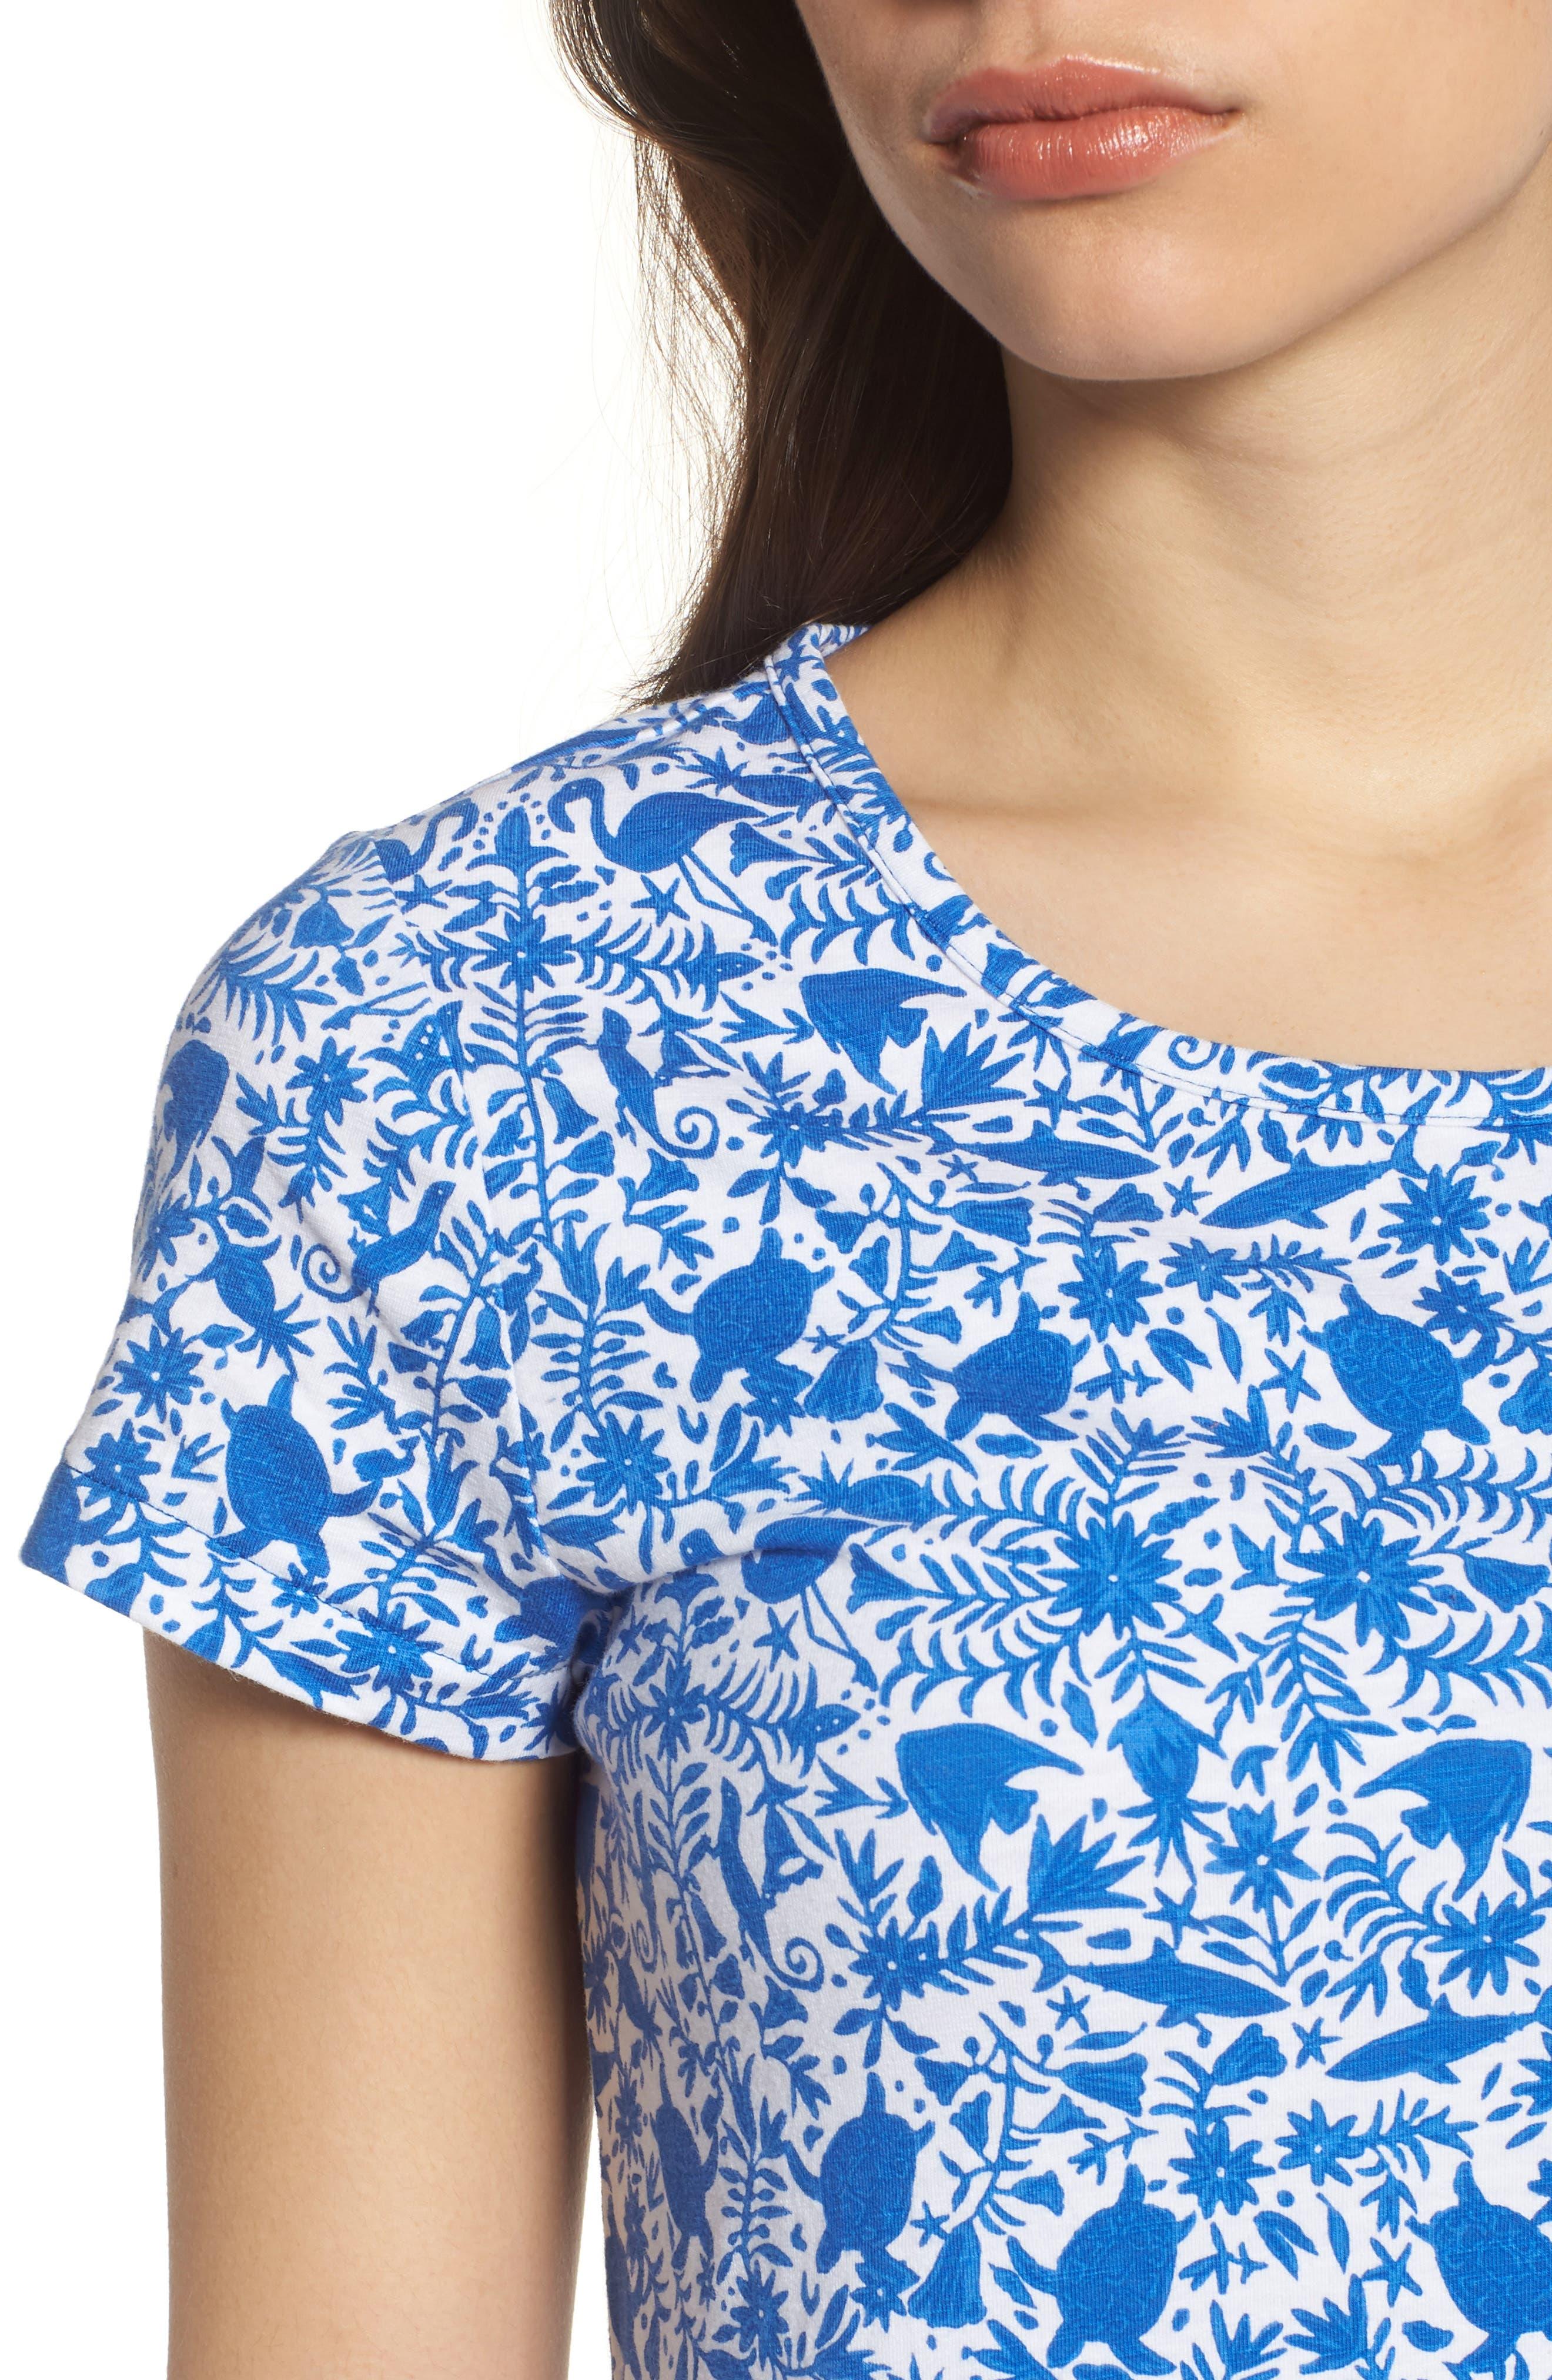 Bahamas Otomi Print Stretch Cotton Dress,                             Alternate thumbnail 4, color,                             Yacht Blue